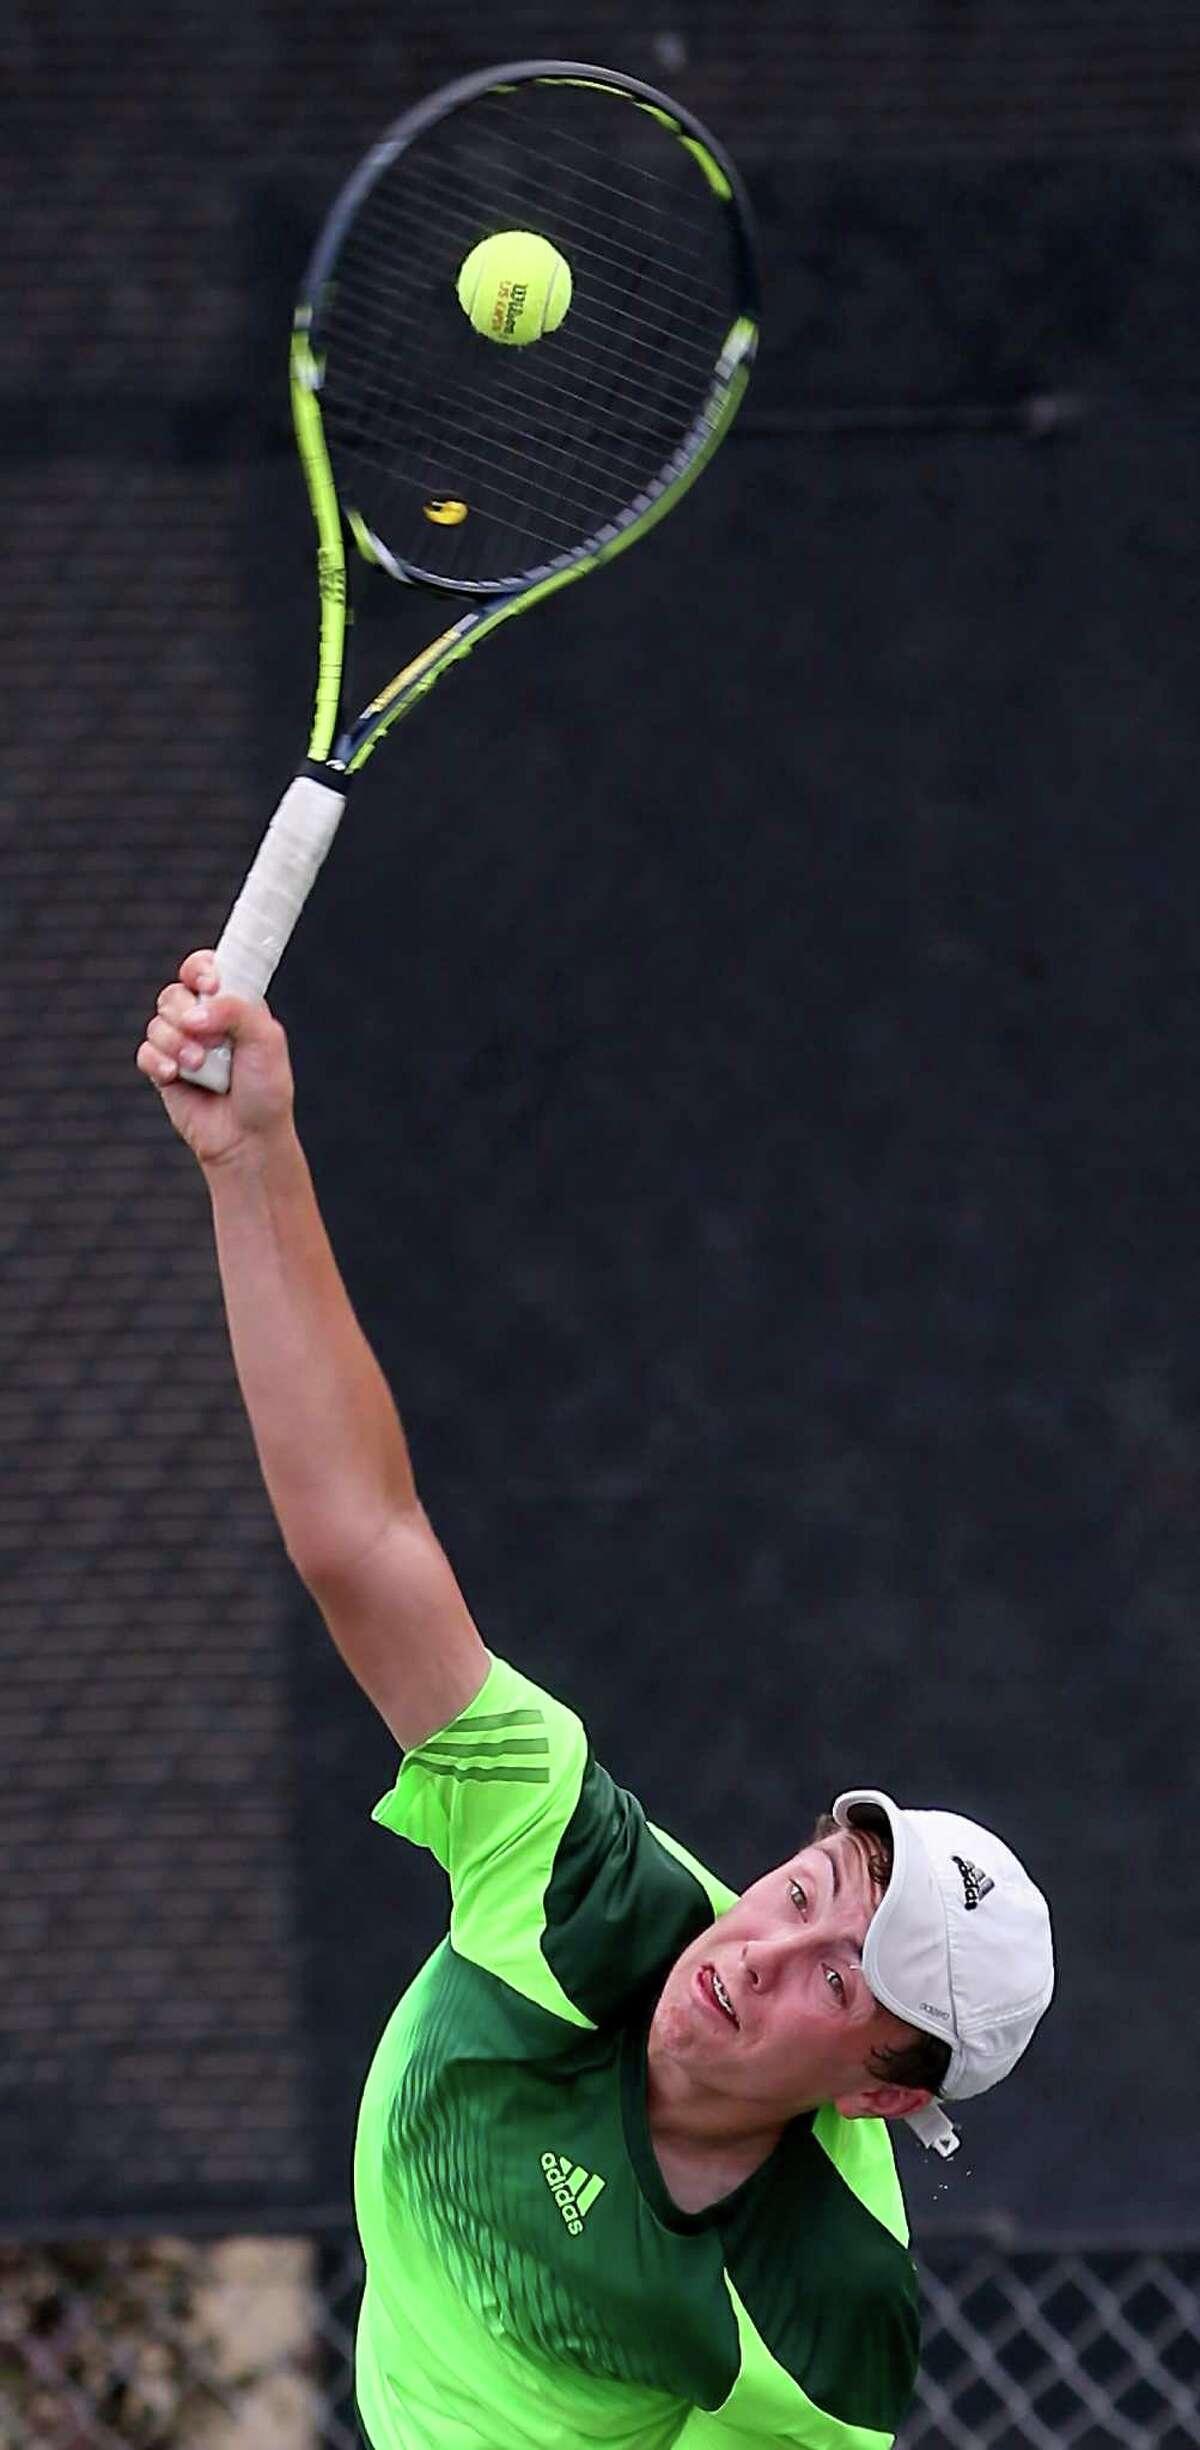 Reagan's Eddie Ayers competes April 22, 2015 at the McFarland Tennis Center in the Region IV-6A tennis tournament against Gabriel Burundi. Ayers won 6-1, 7-6 (1).